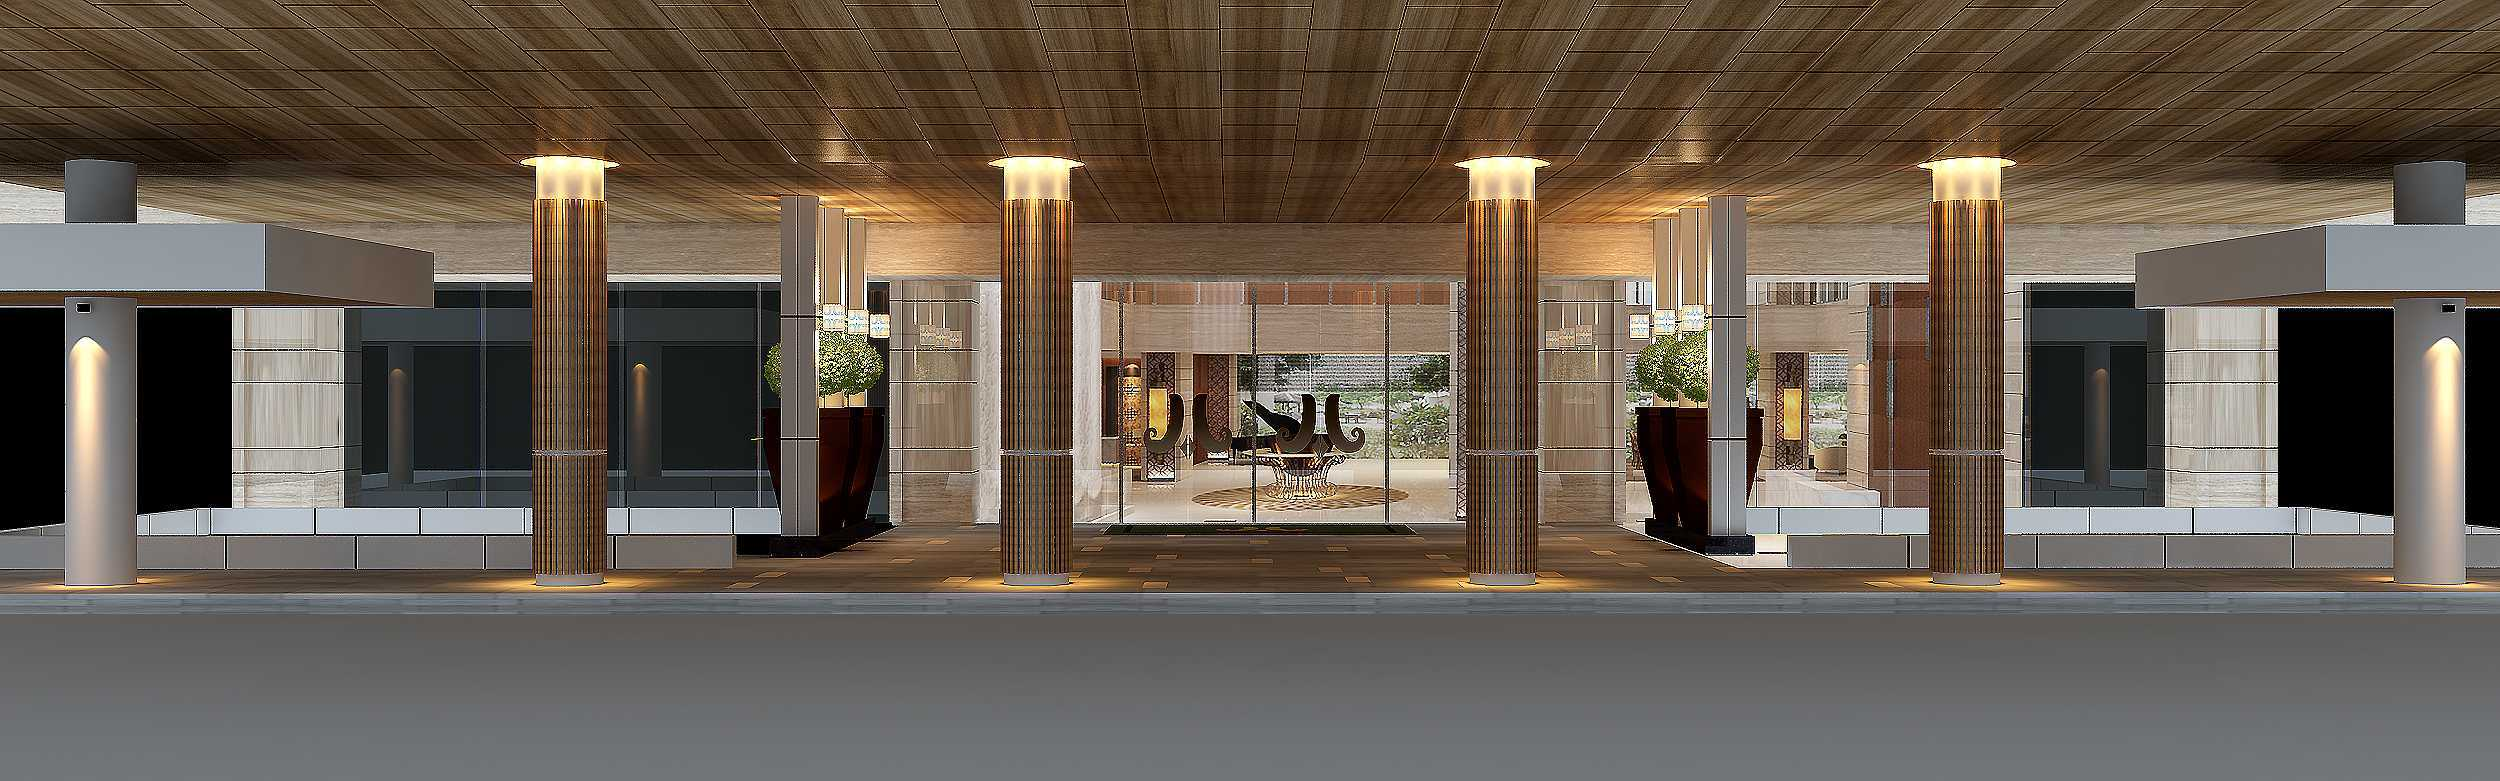 Pt.buana Pratama Interindo Hotel Ambarukmo & Ballroom Kota Yogyakarta, Daerah Istimewa Yogyakarta, Indonesia  Drop Off Lobby Kontemporer  43360